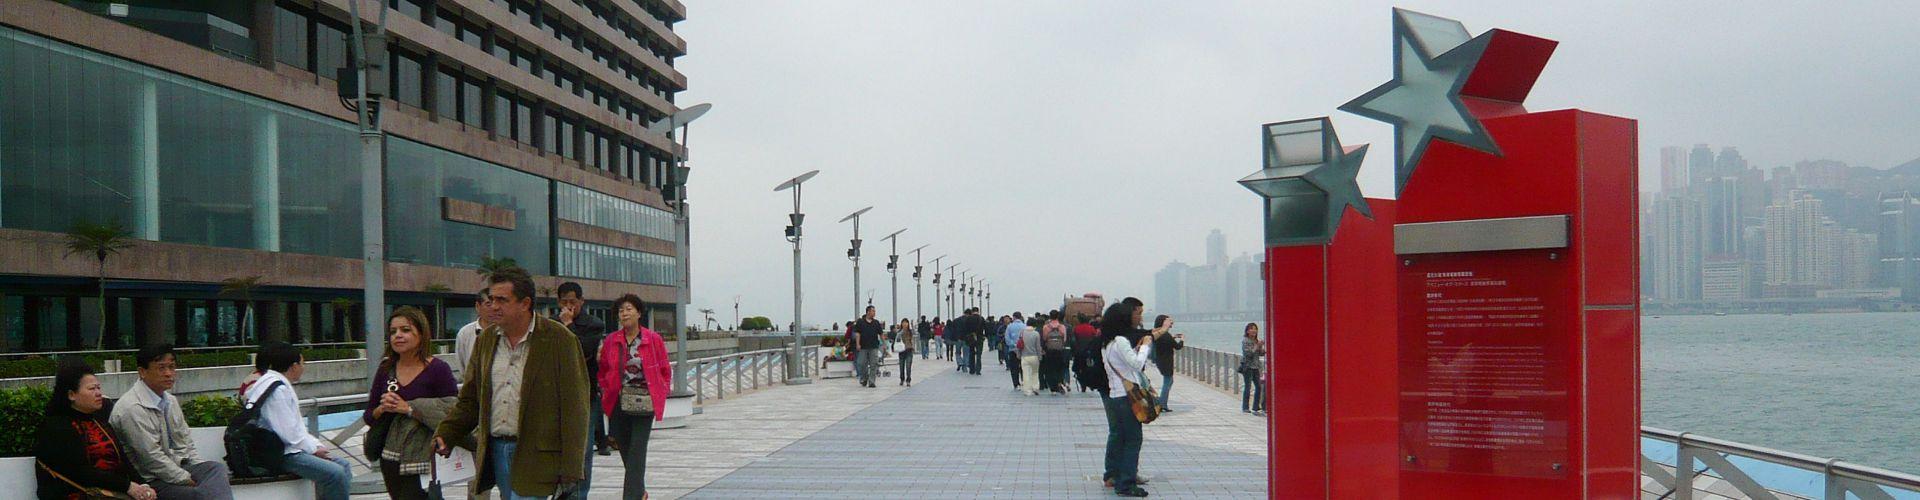 Avenue of the Stars - Walking - Hong Kong - Reviews - ellgeeBE